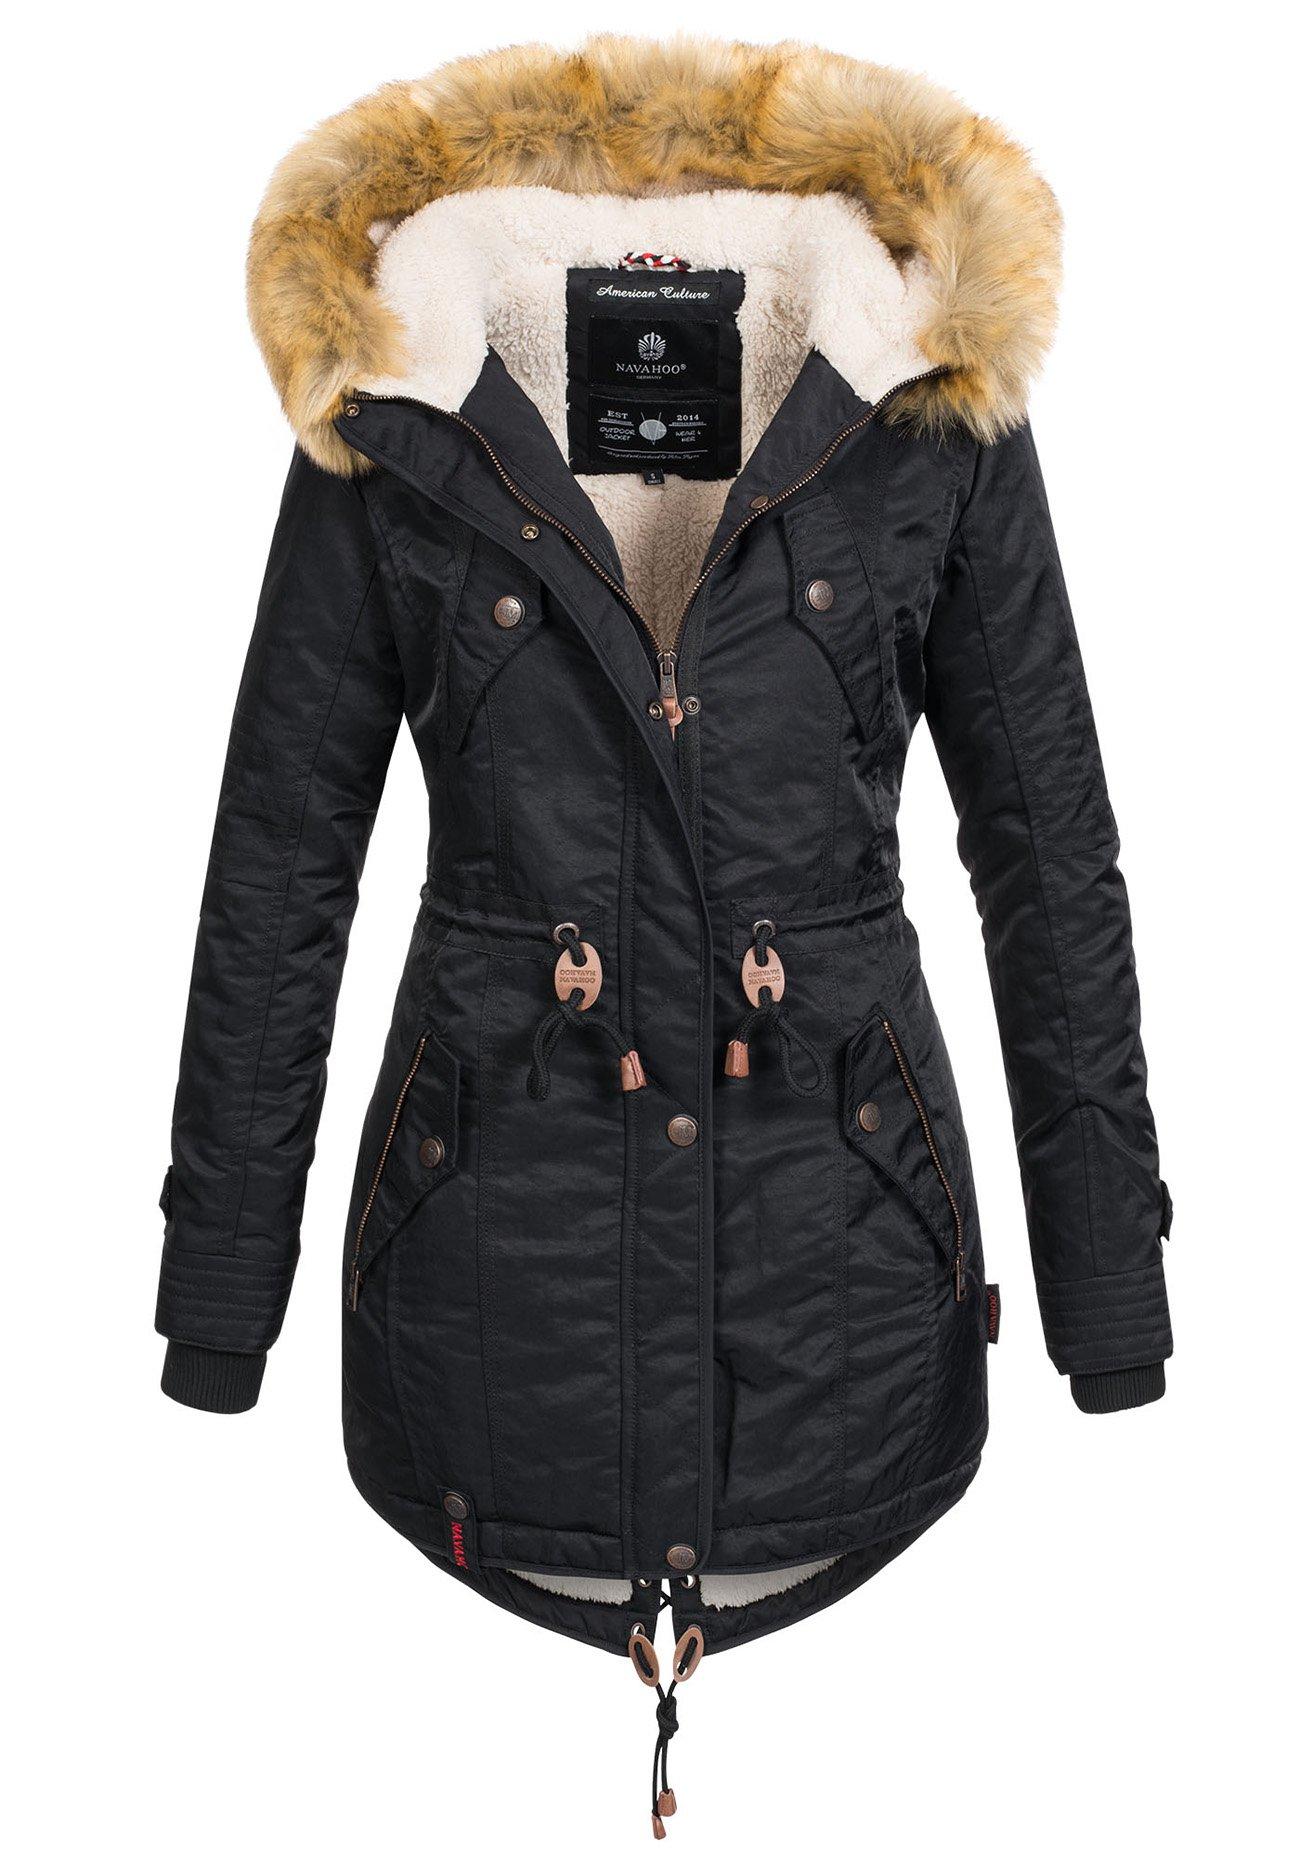 Damen Winter Jacke Warm Parka Winter Lang Mantel mit Kapuze S-XL 7758